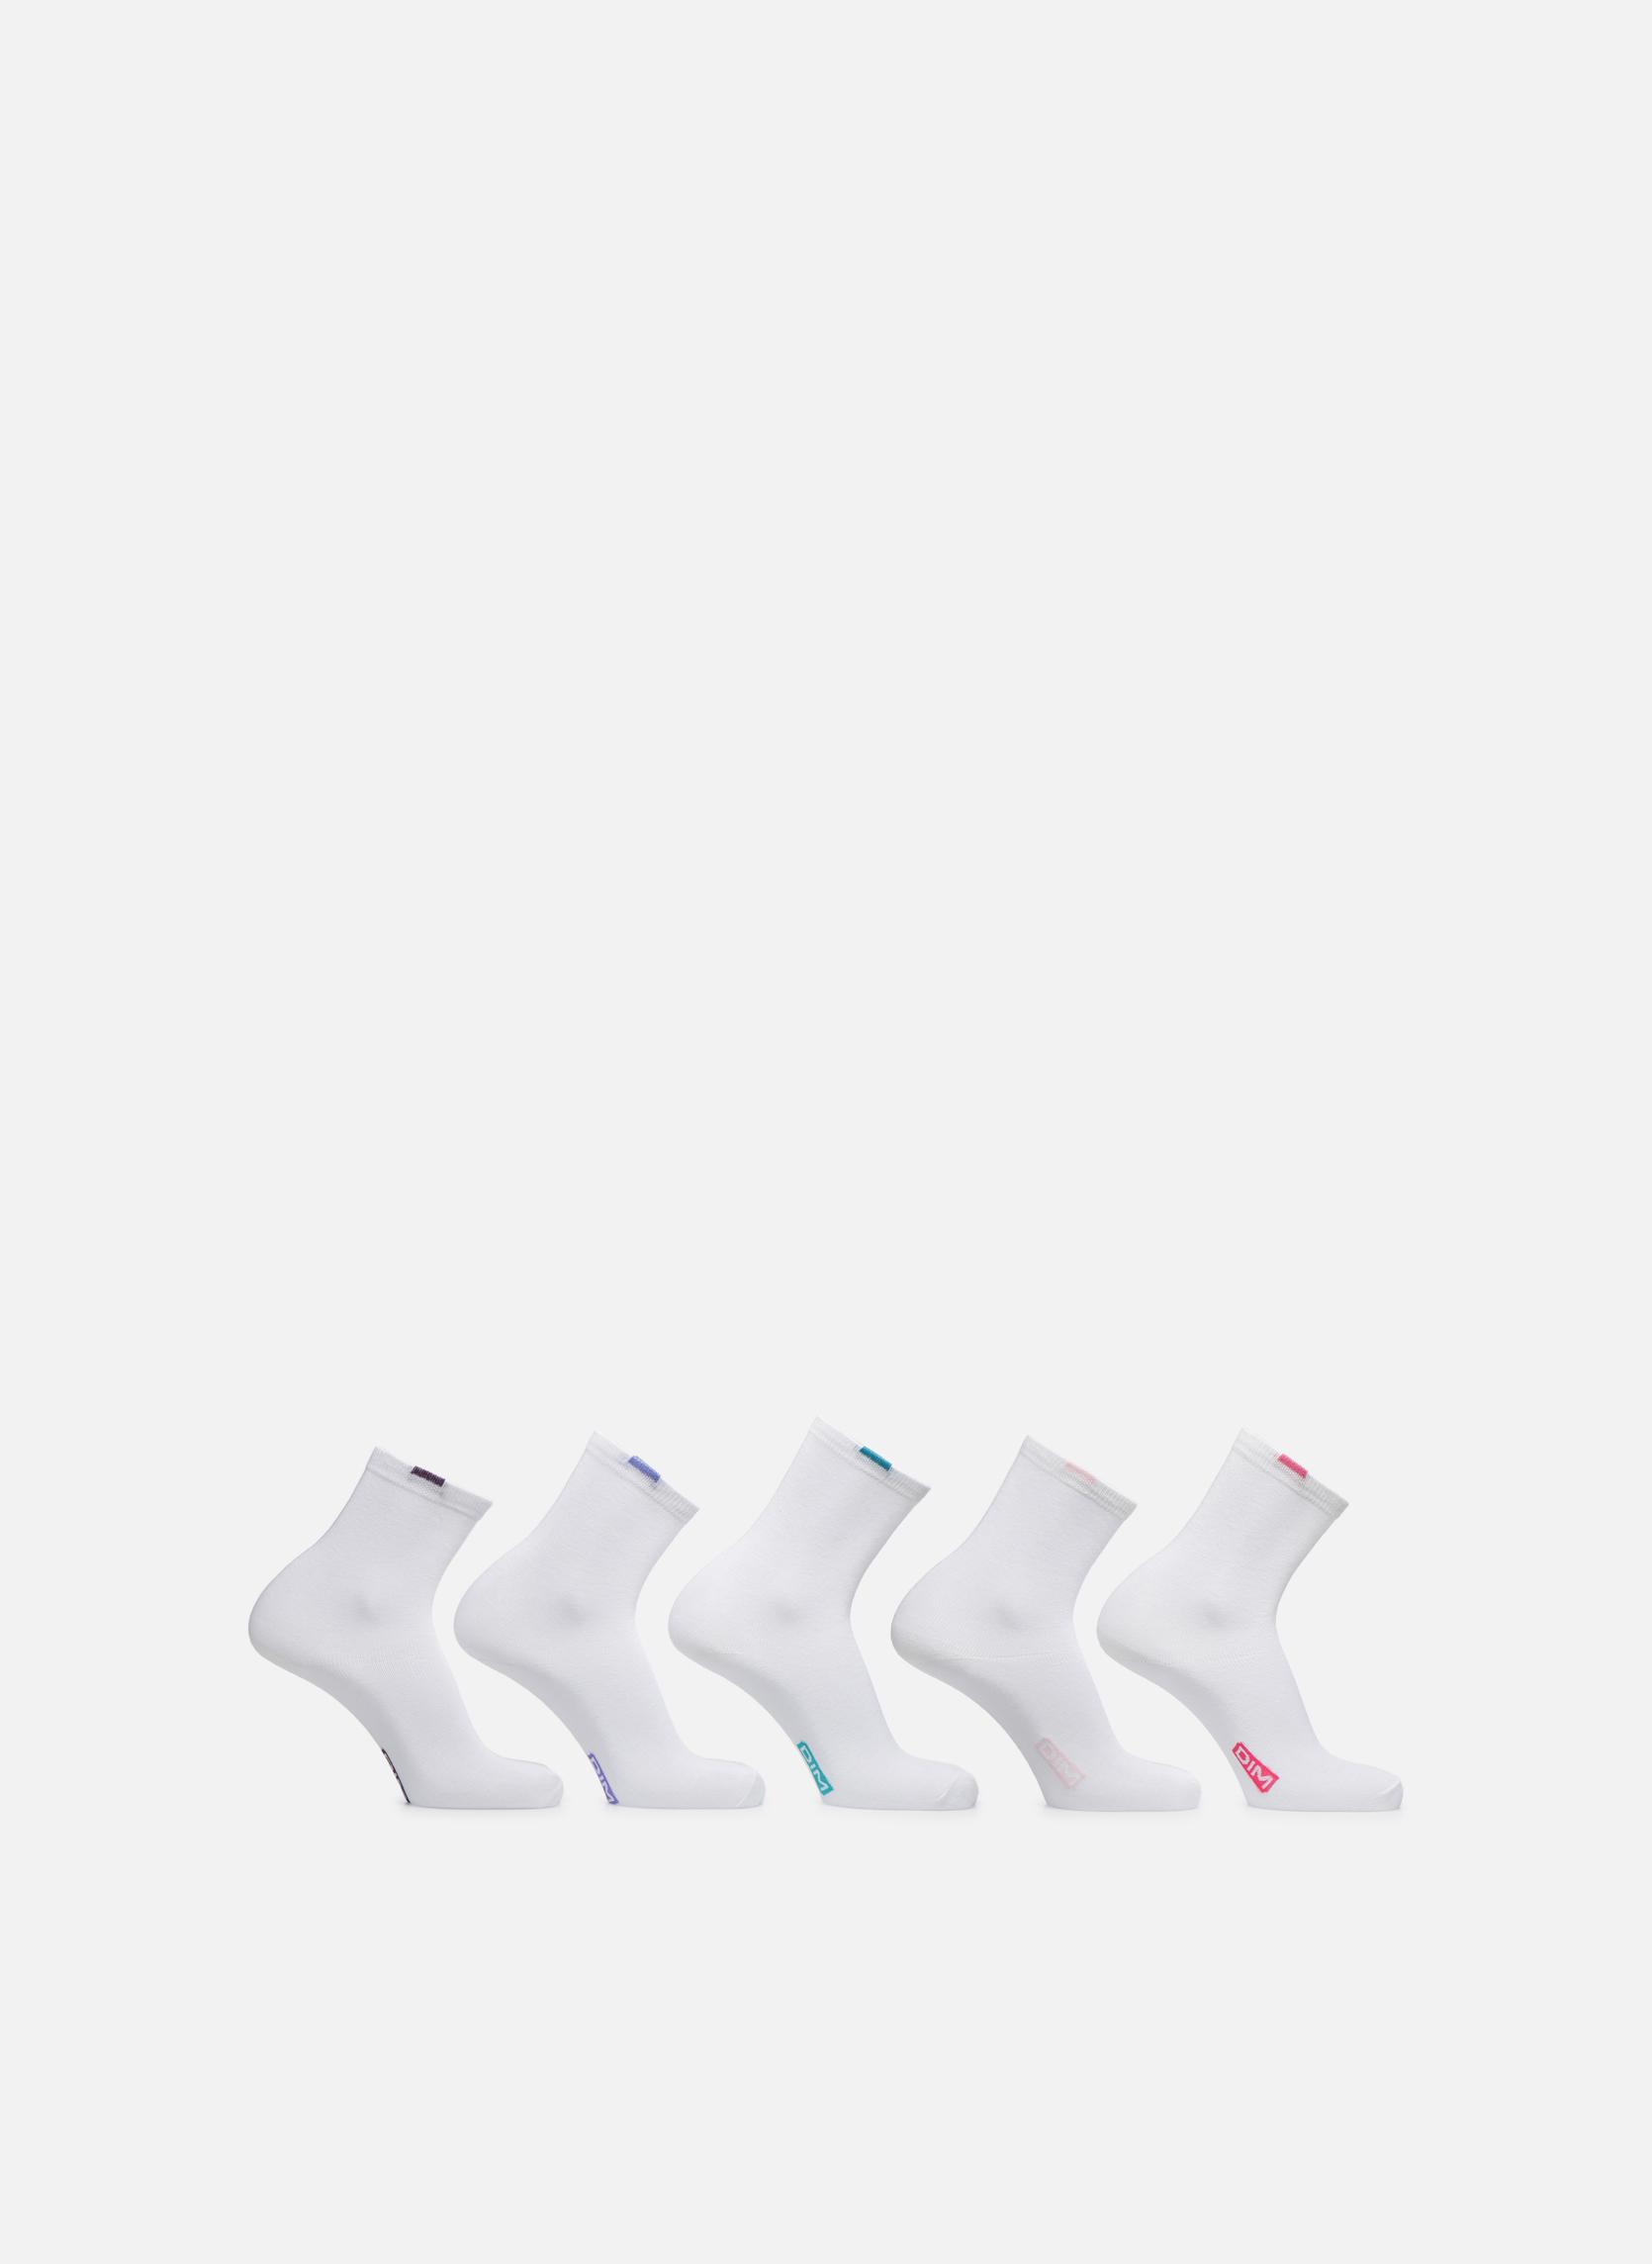 Medias y Calcetines Accesorios Chaussettes EcoDimW Pack de 5